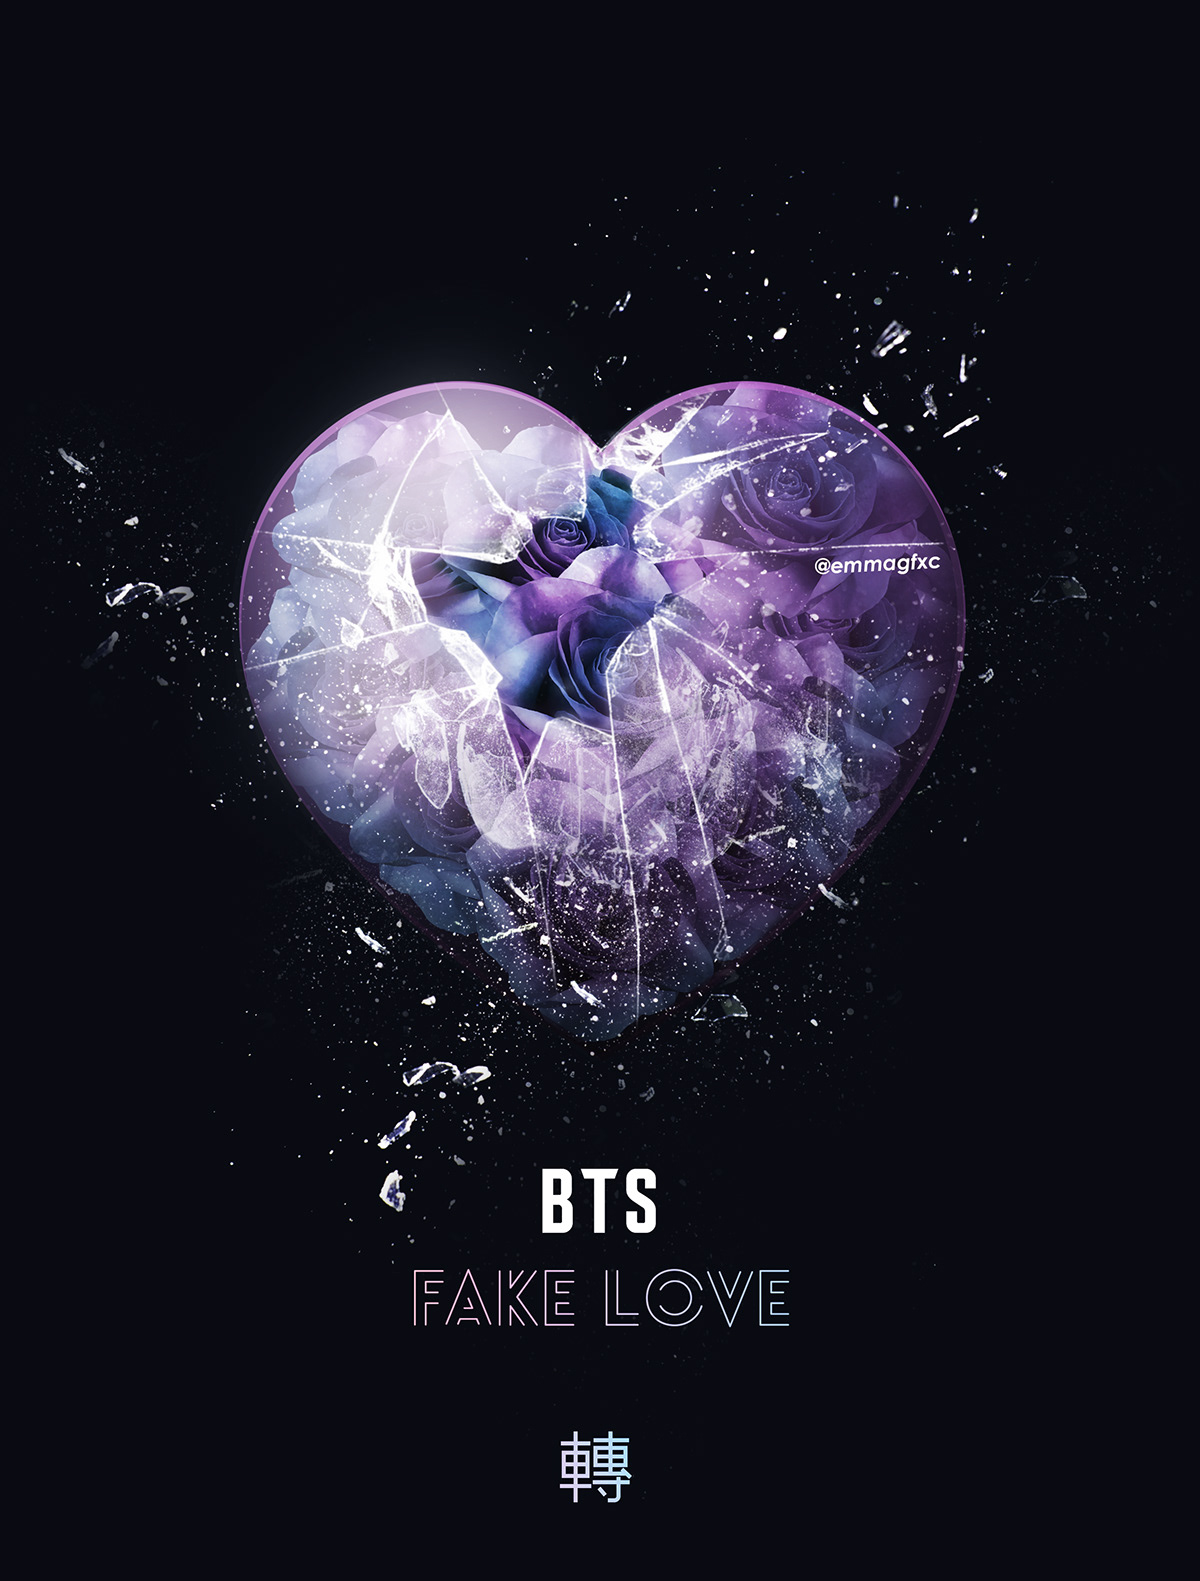 Bts fake love english song download | Bts Fake Love Mp3